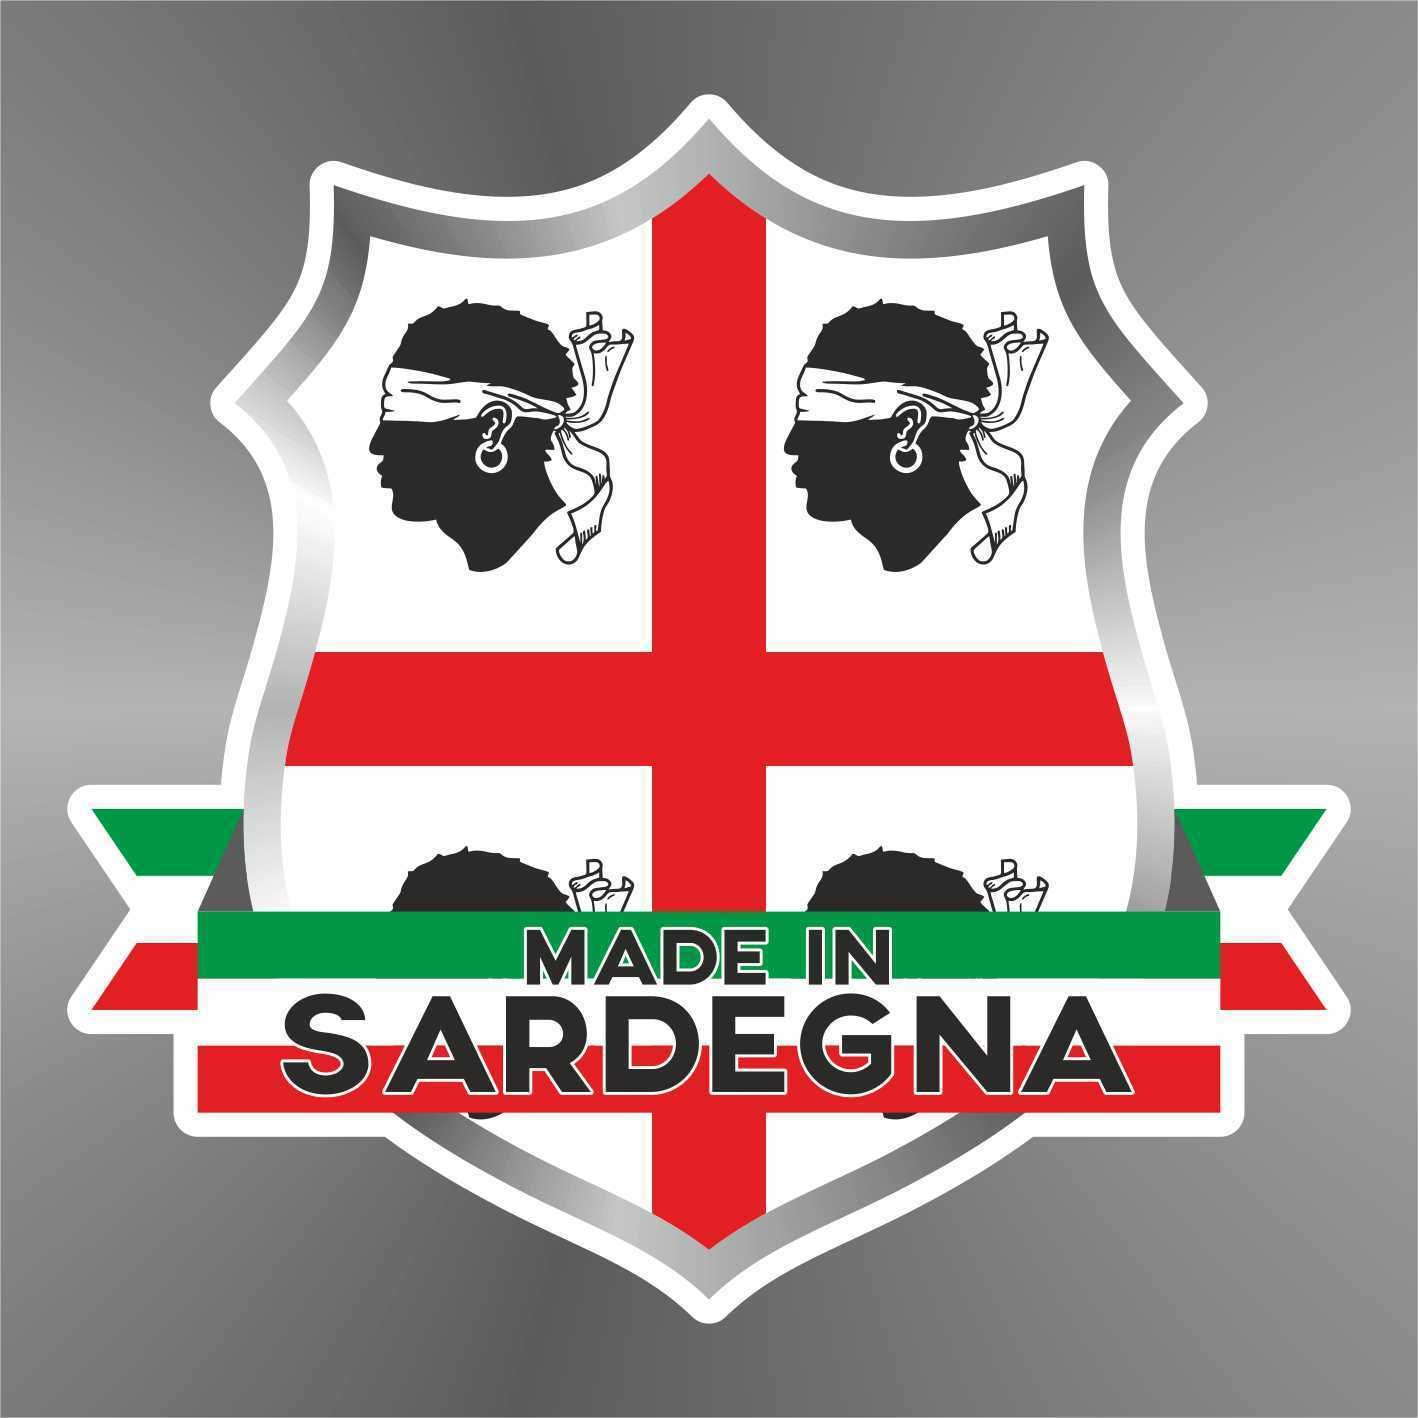 Sticker Sardegna Sardaigne Cerdeñ a Sardinia Sardinien Italia Italy Italie Italien - Decal Cars Motorcycles Helmet Wall Camper Bike Adesivo Adhesive Autocollant Pegatina Aufkleber - cm 10 erreinge